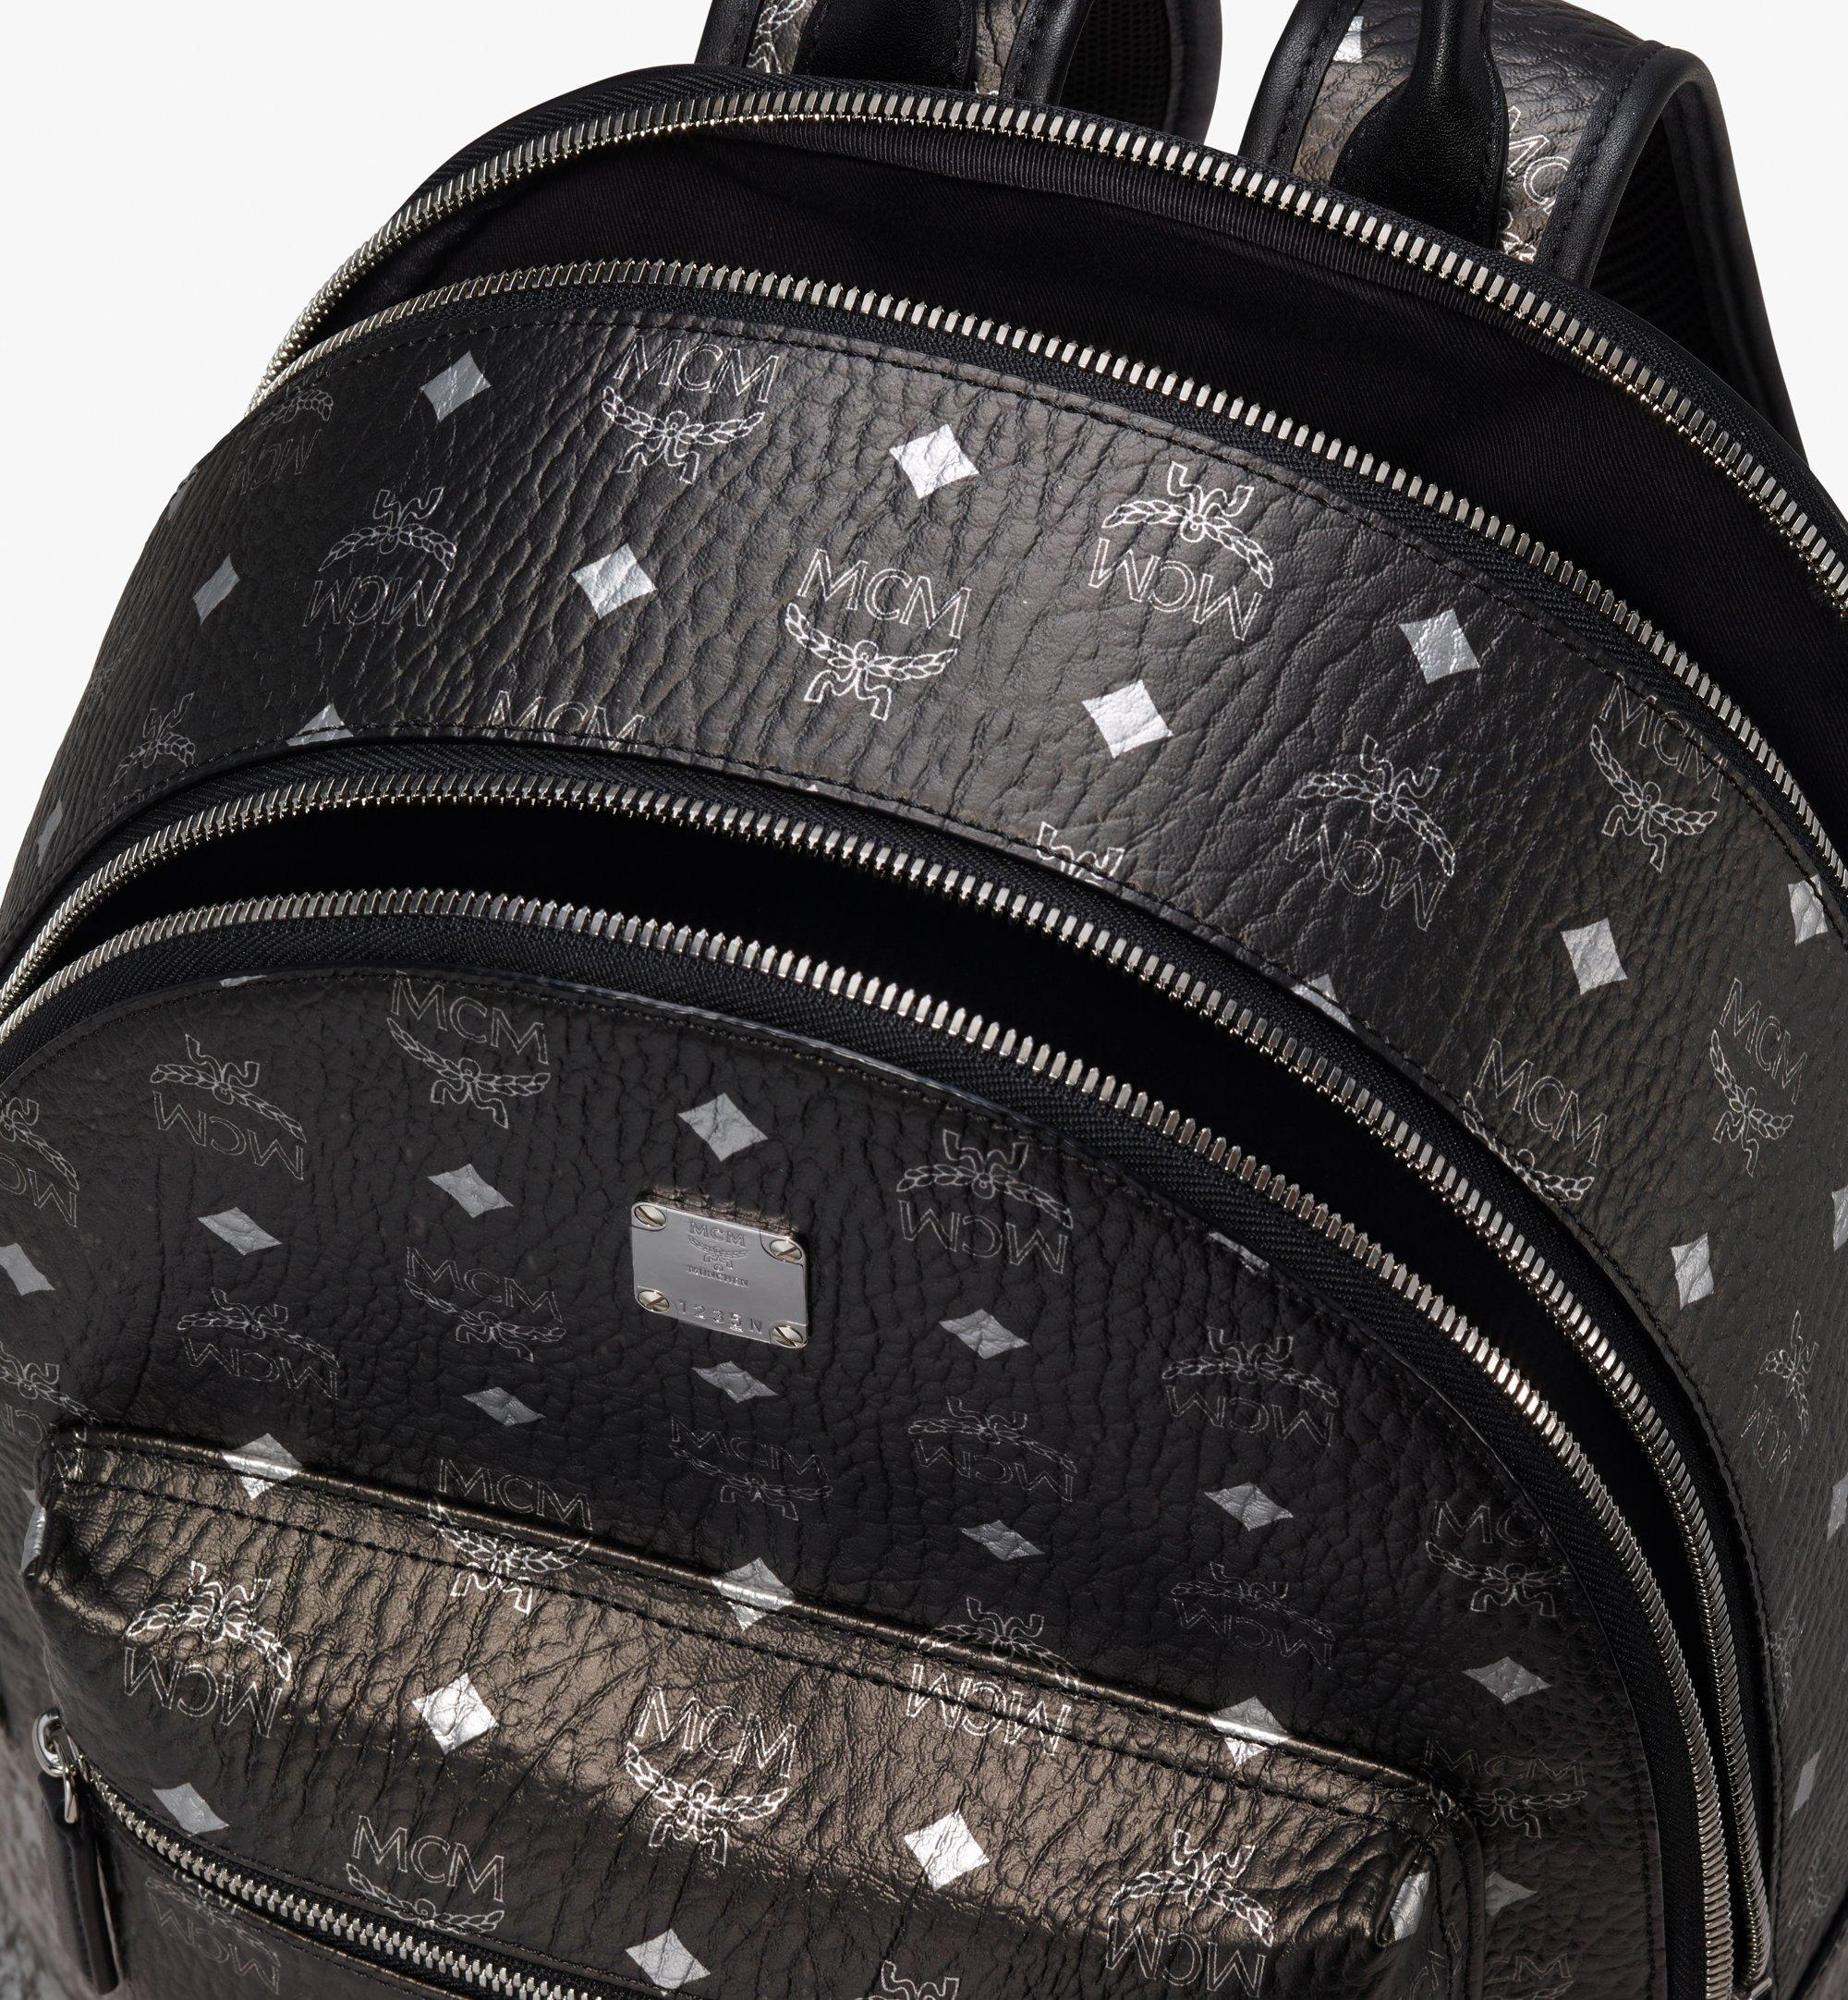 40 cm 16 in Stark Backpack in Gradation Visetos Silver